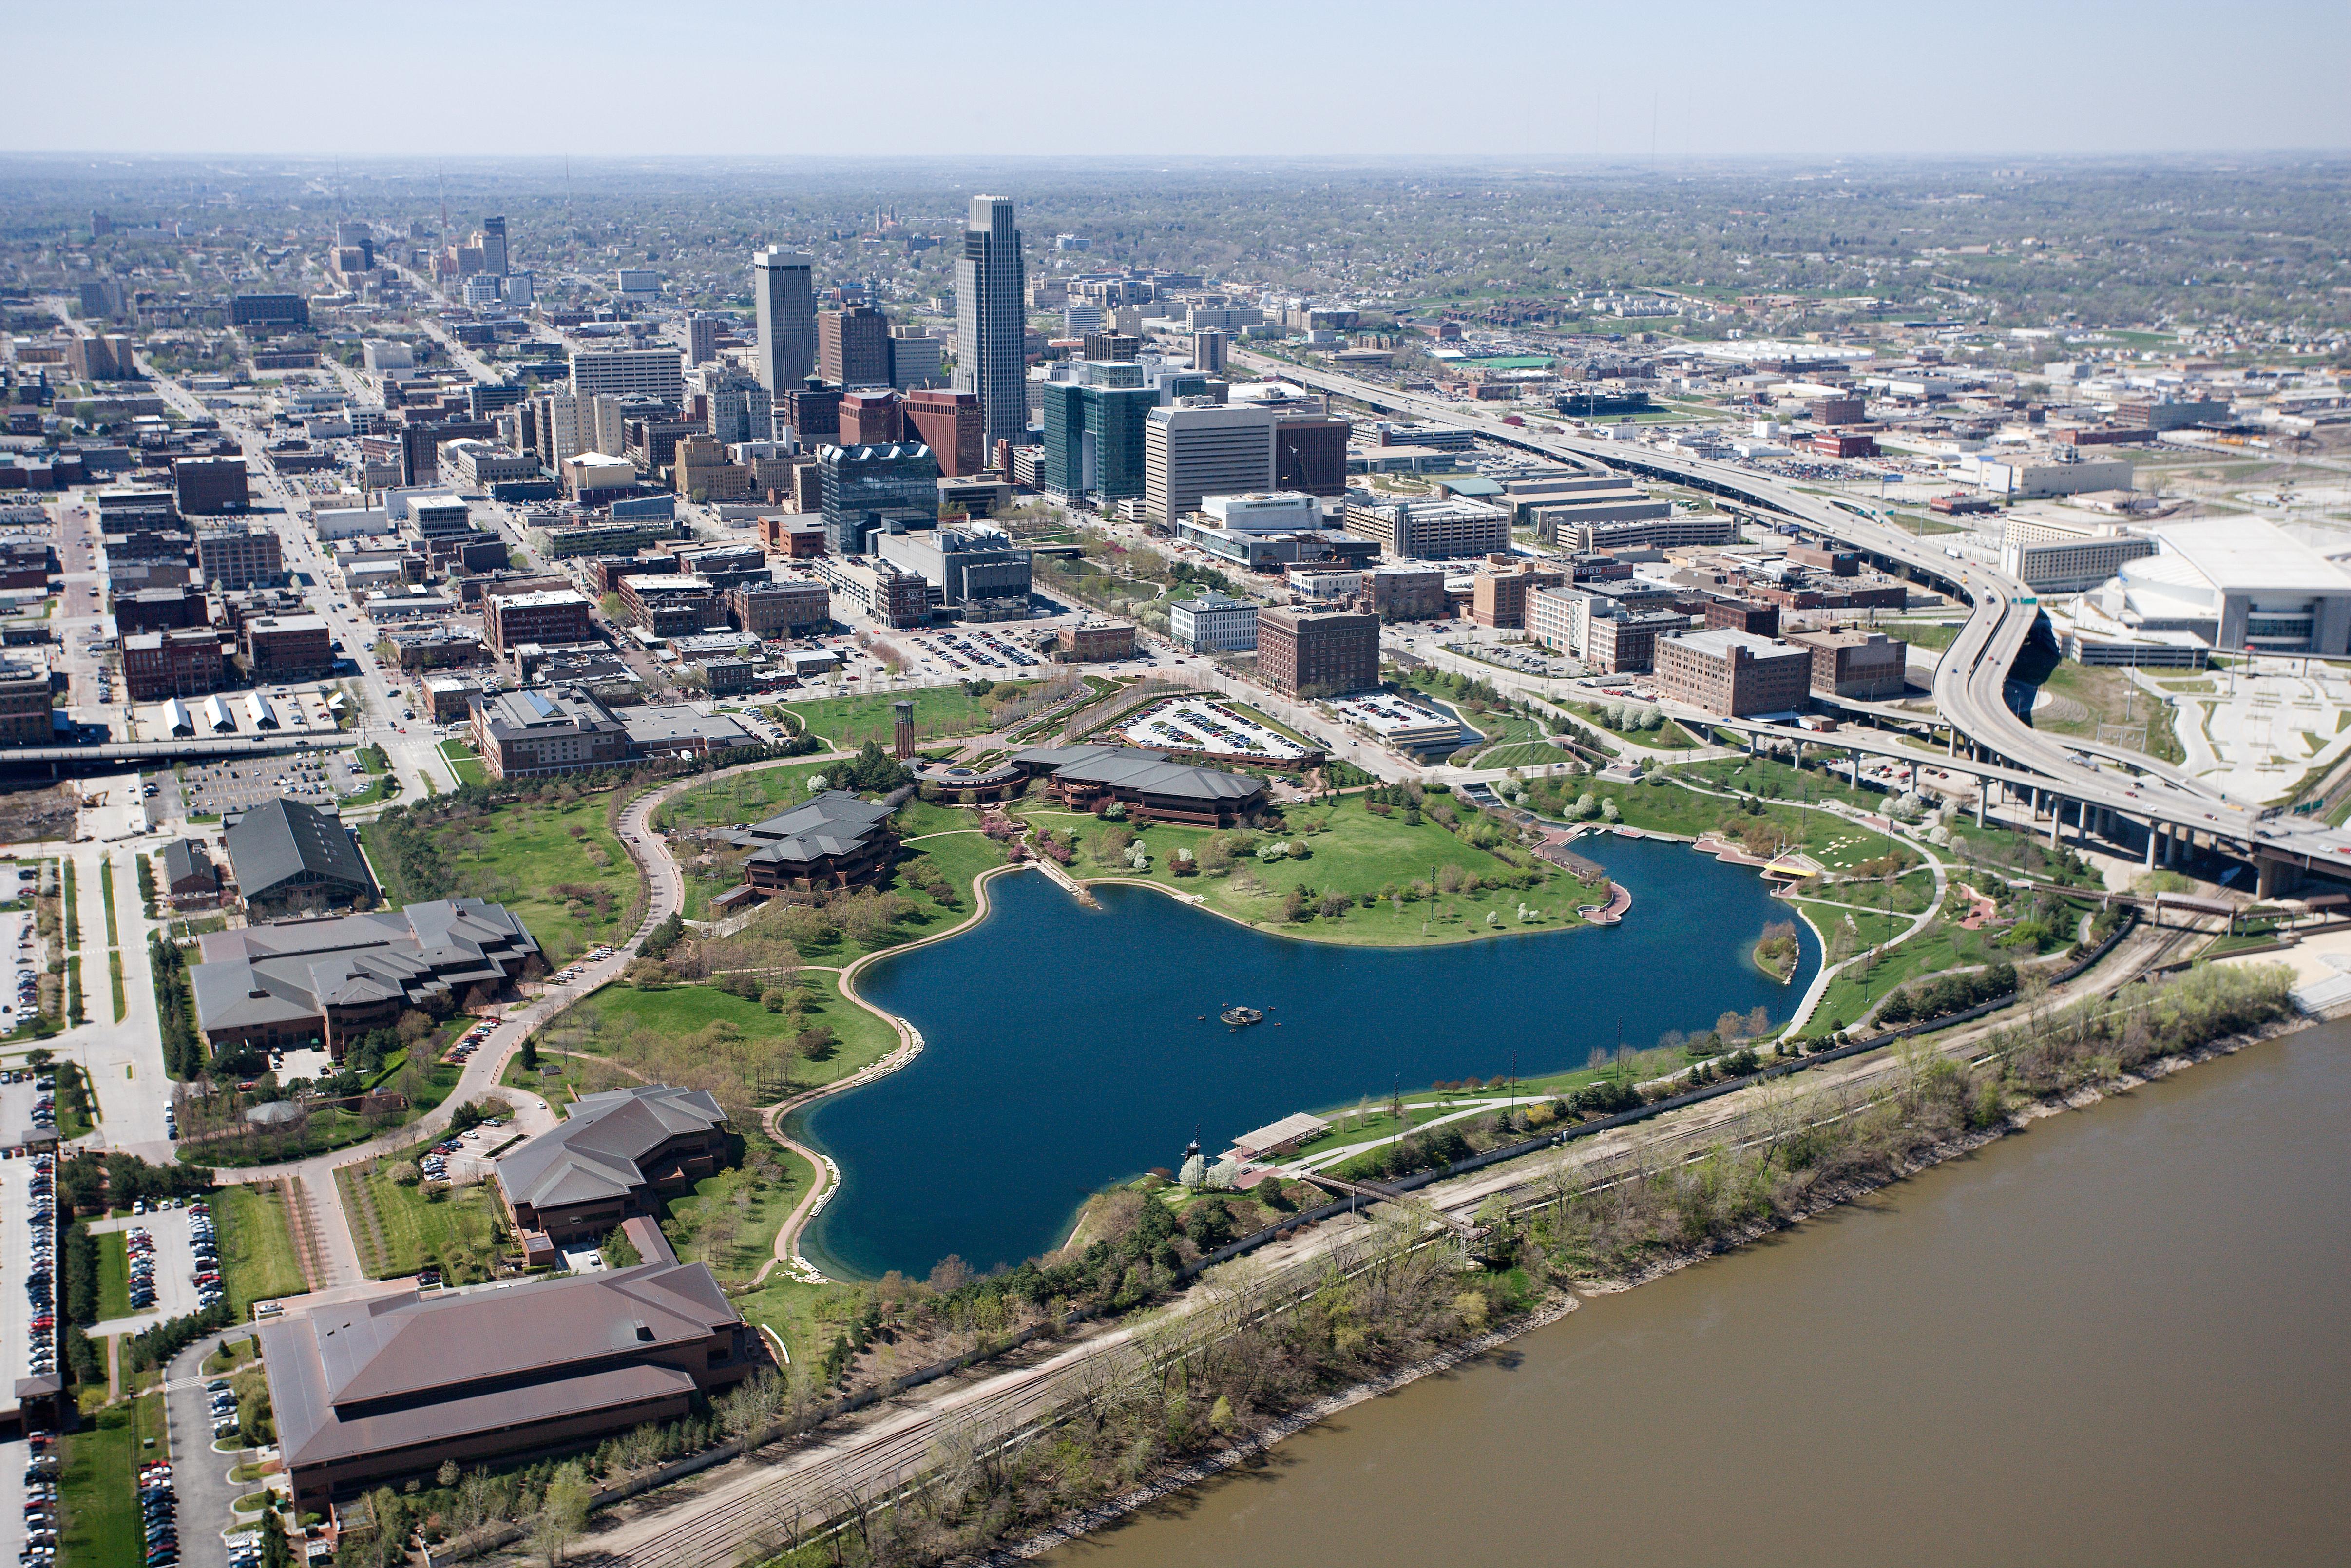 Nebraska's largest city is Omaha